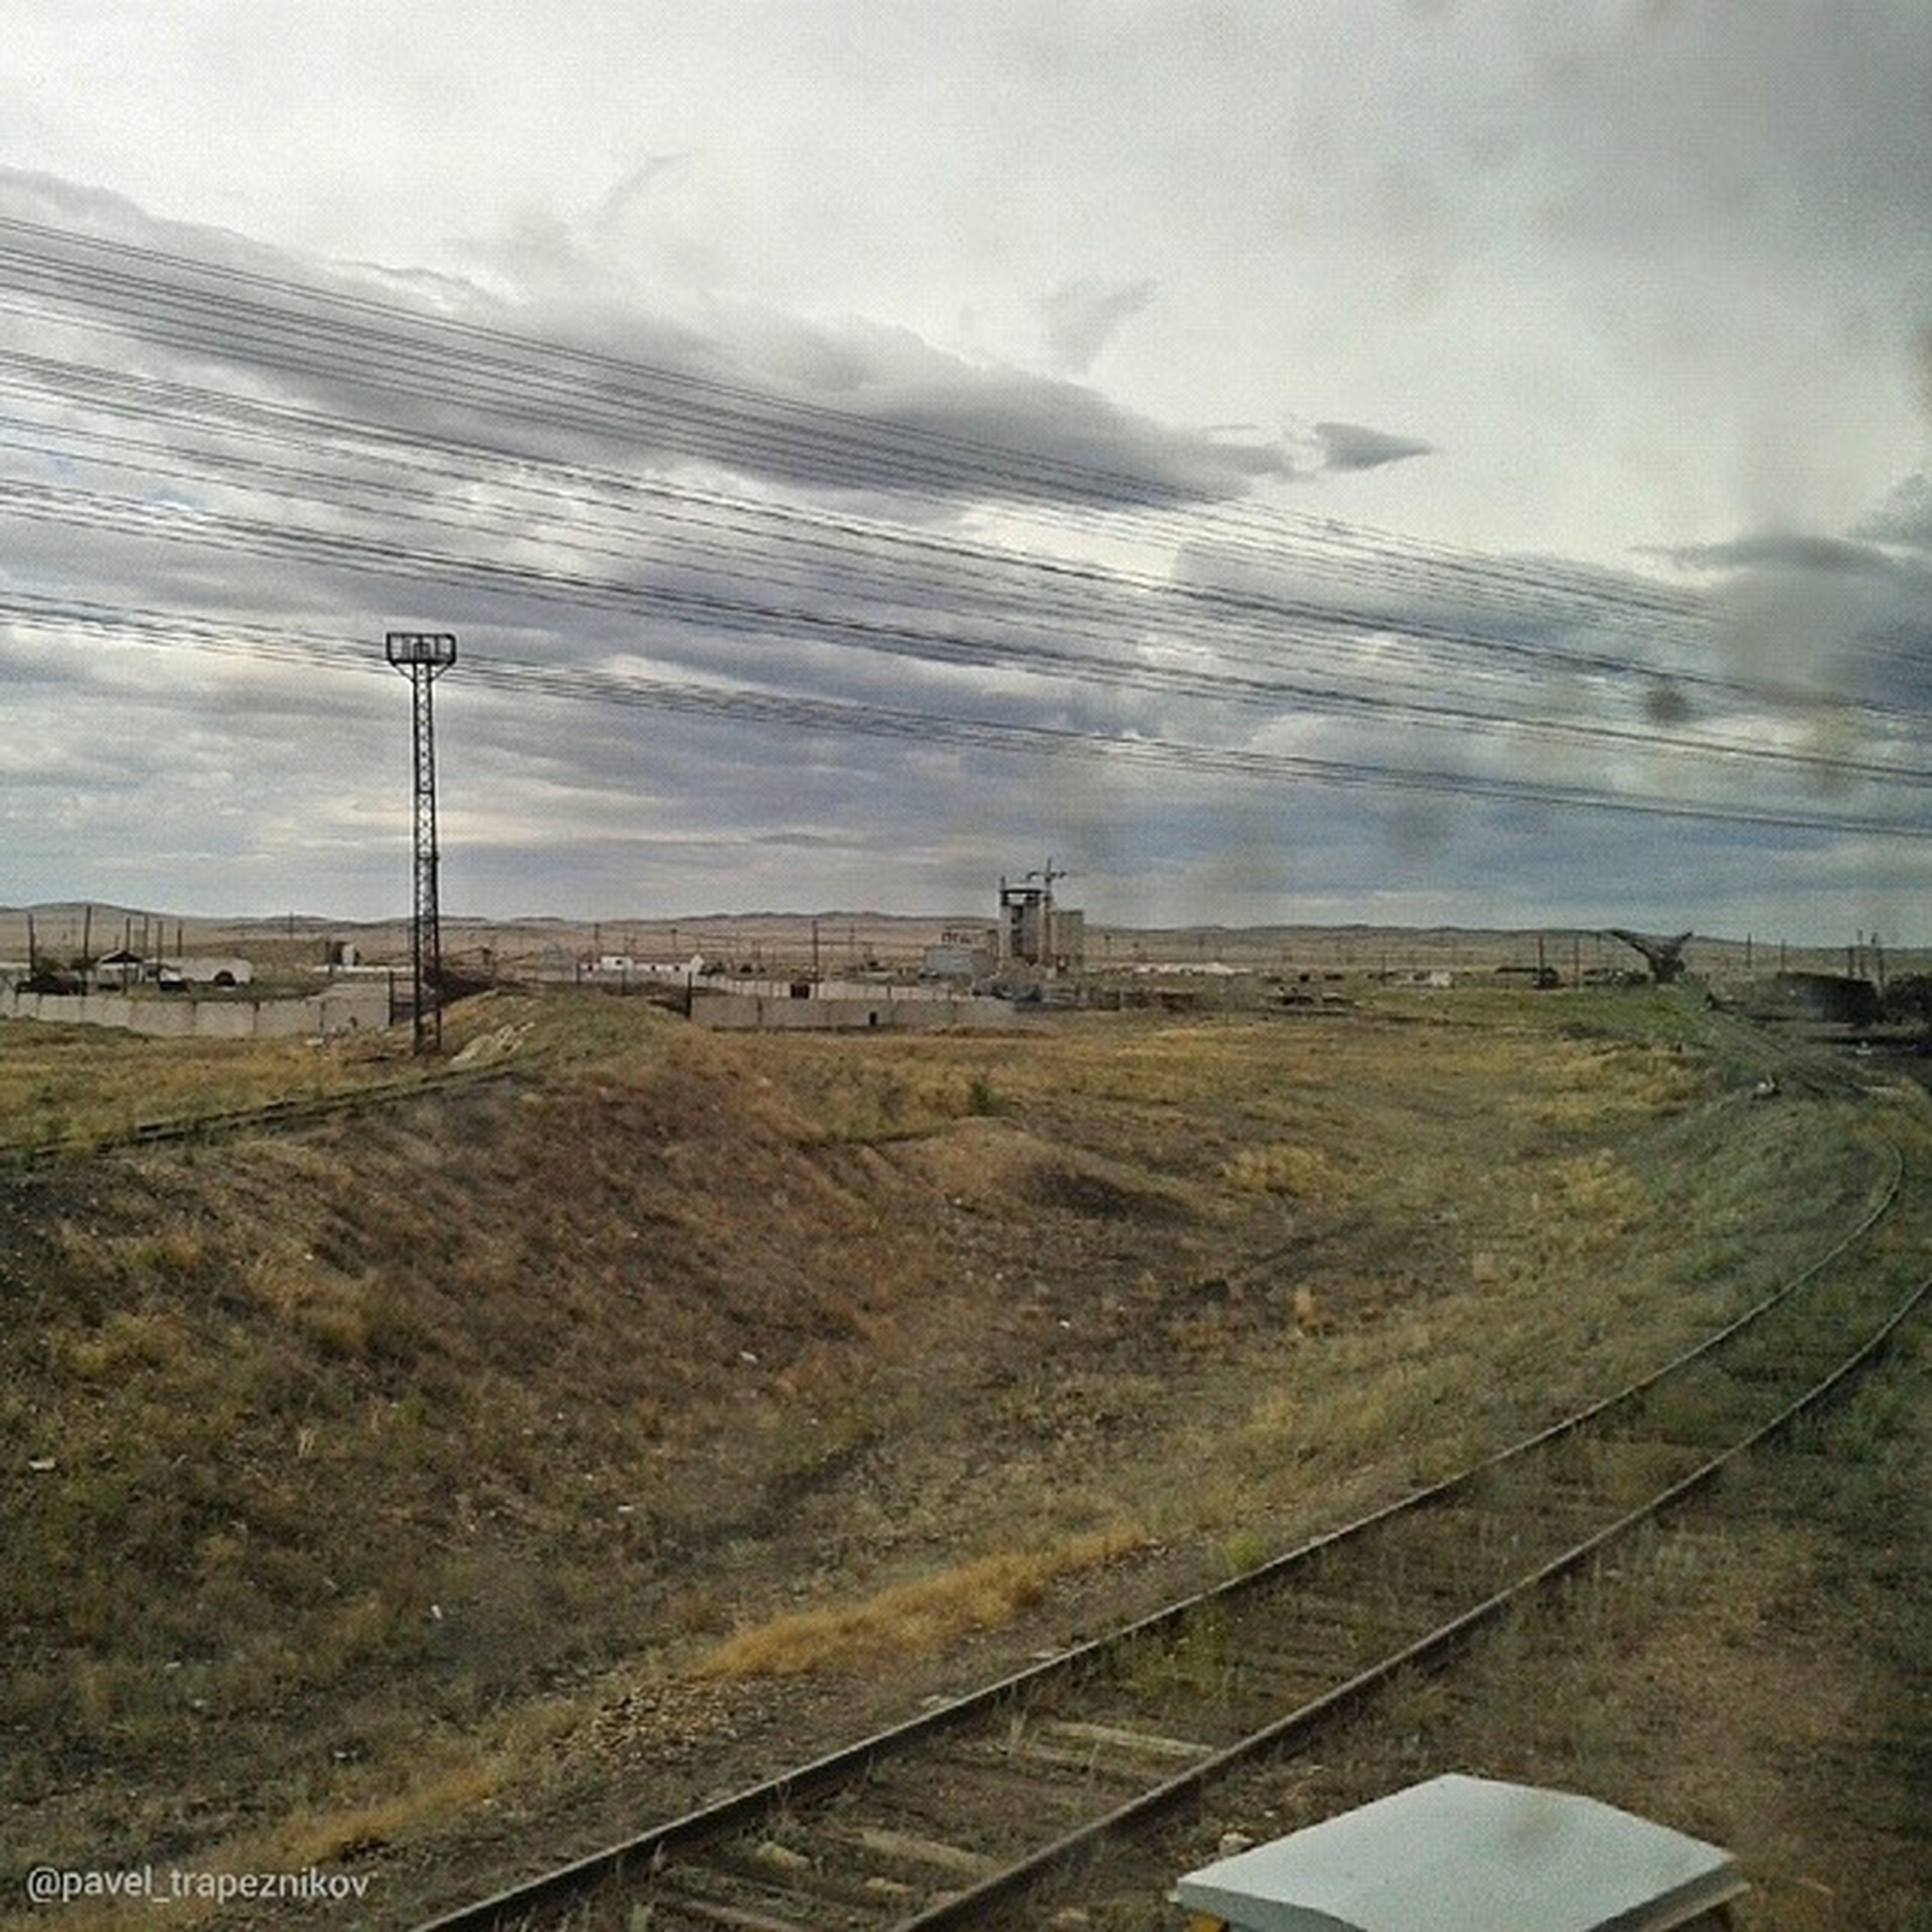 20140728 , Казахстан . Наше путешествие . Жангизтобе . Нефтеналивная станция, по нашему мнению;-)/ Kazakhstan. Our travel. Zhangiztobe. Oil loading station, in our opinion.